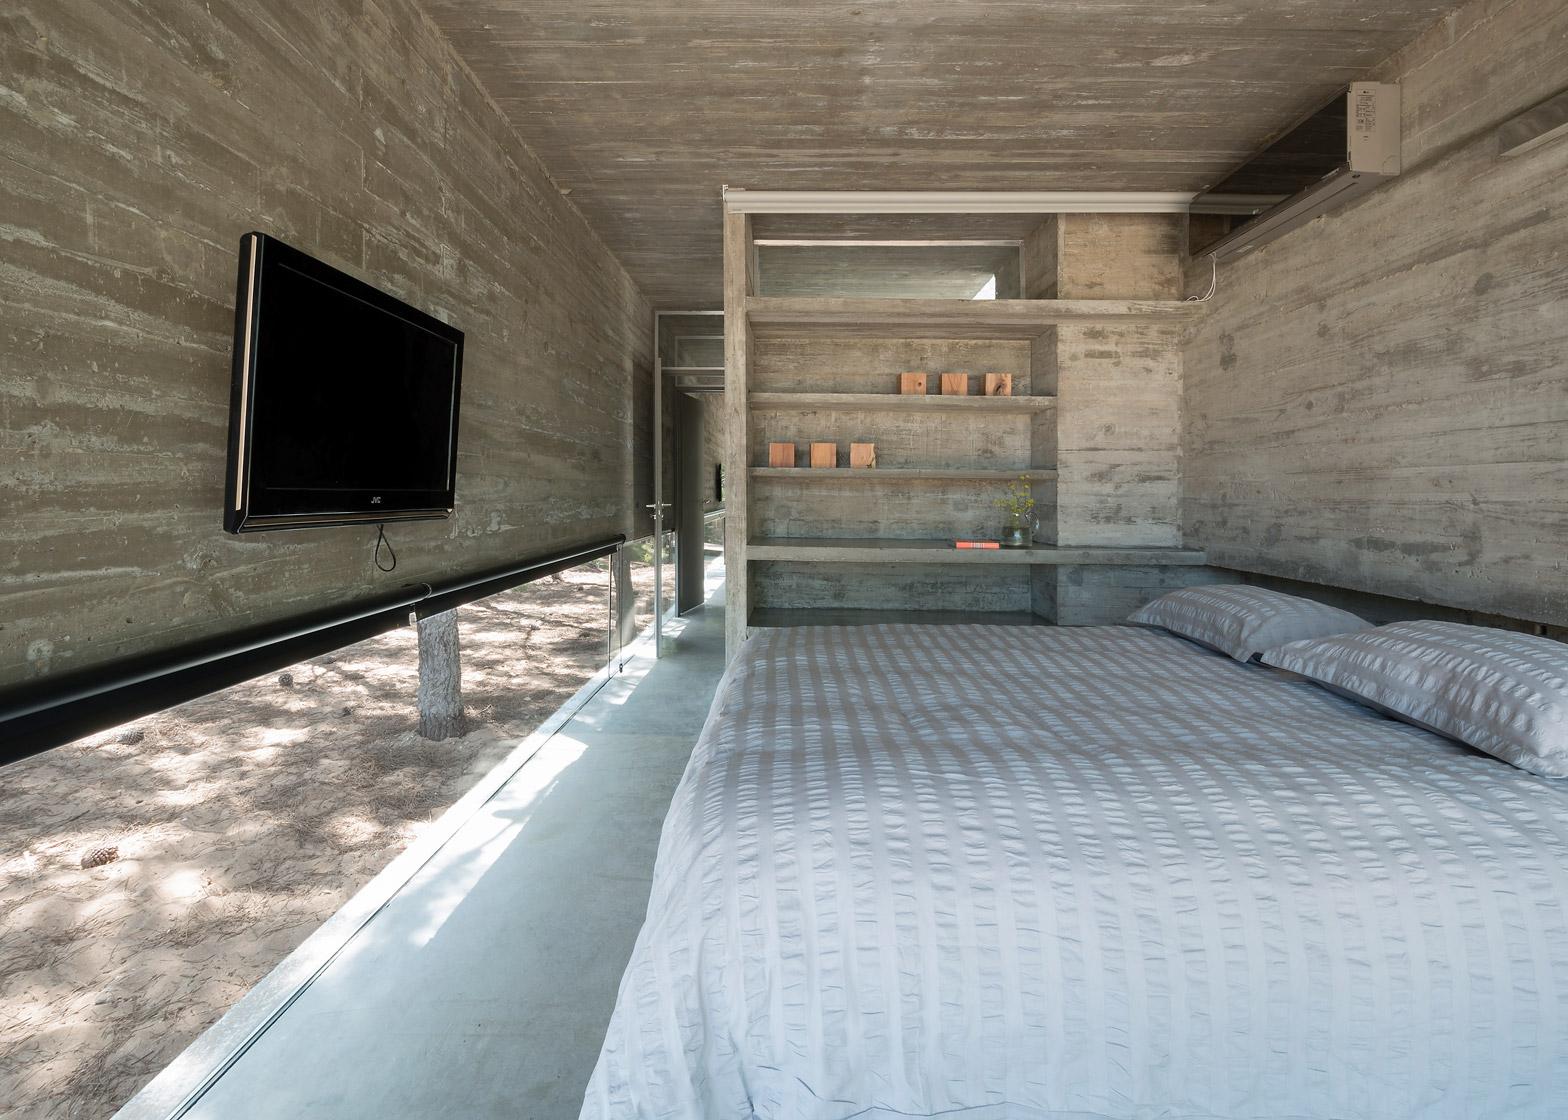 L4 House by Luciano Kruk Arquitectos in Costa Esmeralda, Argentina